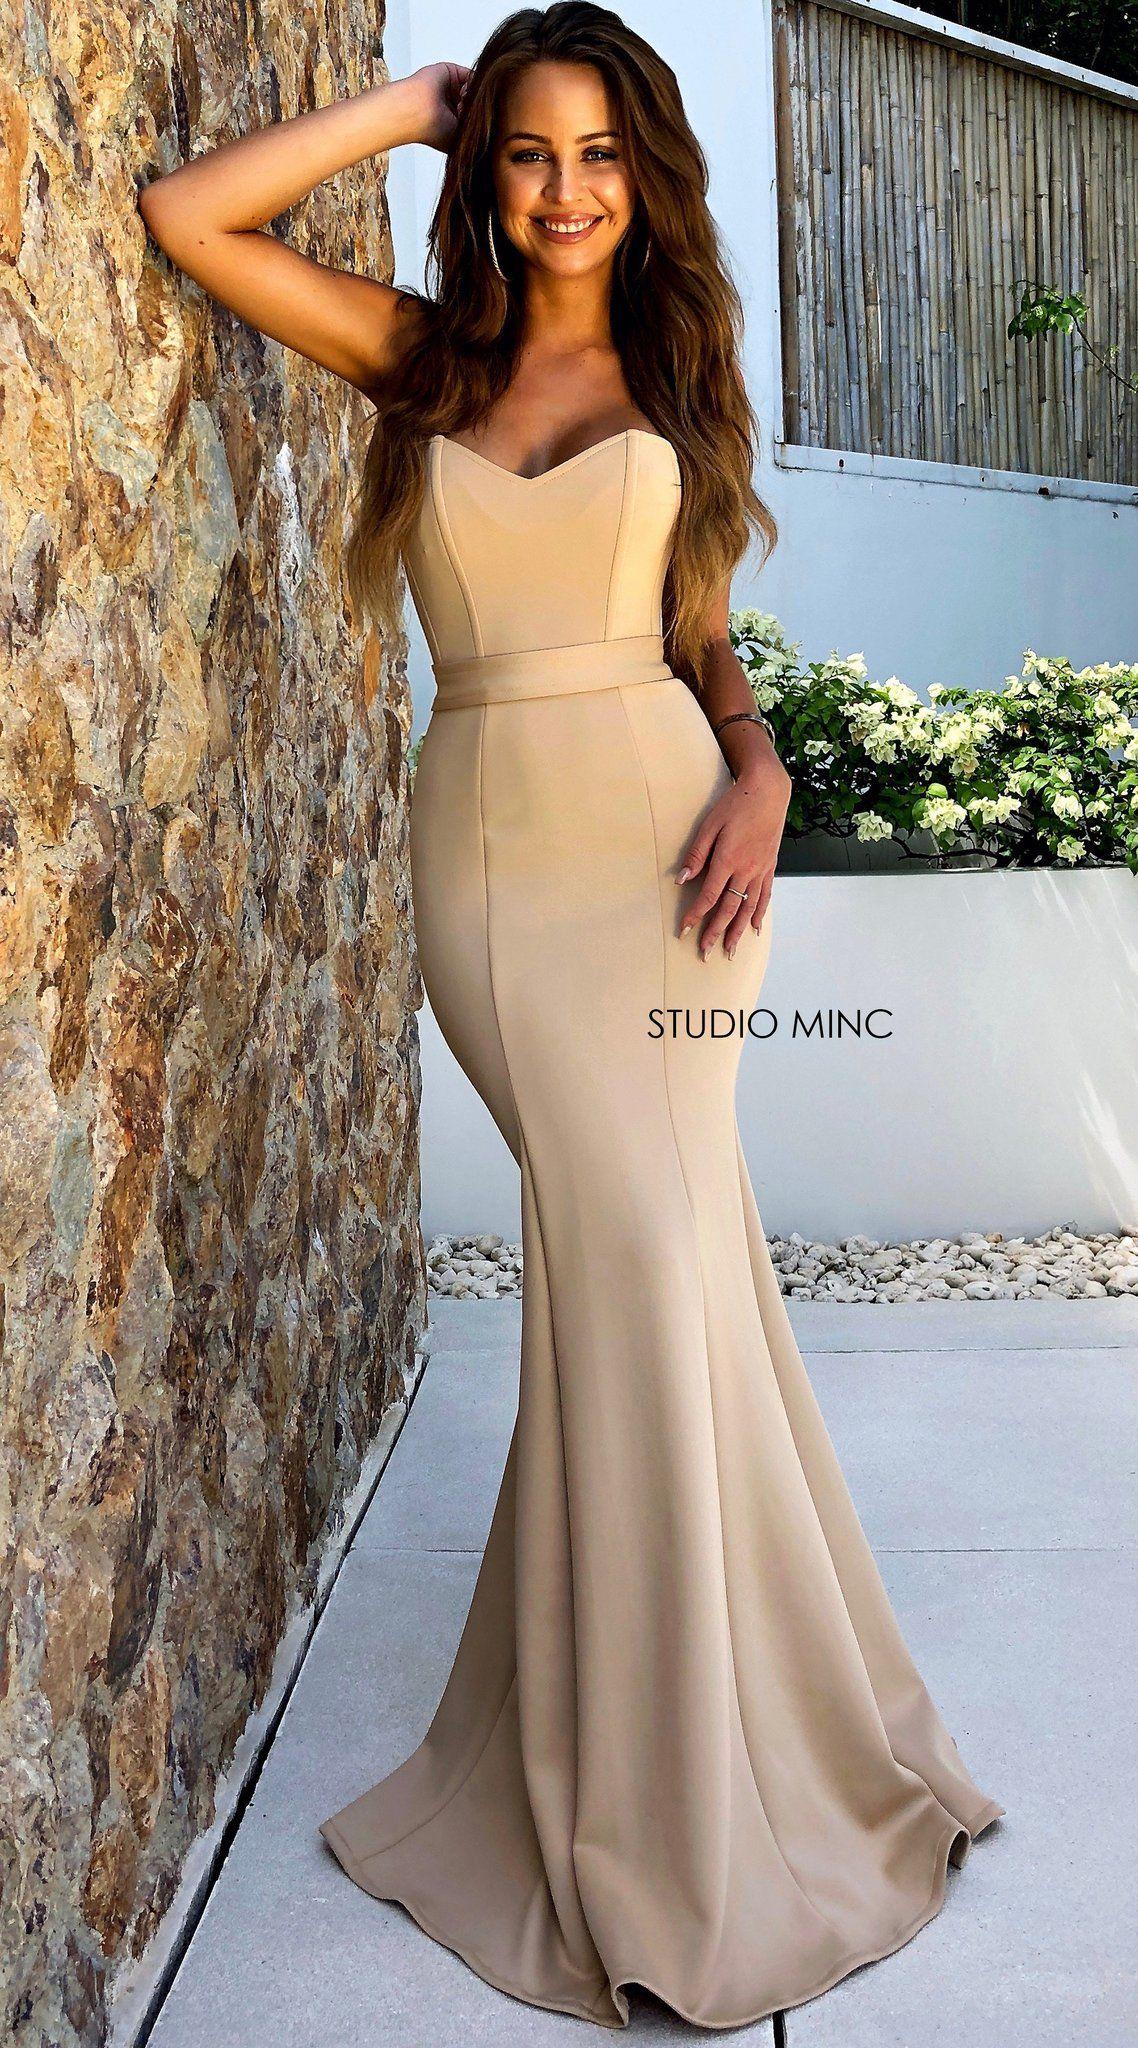 42cc1a609ab Nude III - Formal Prom Dress by STUDIO MINC